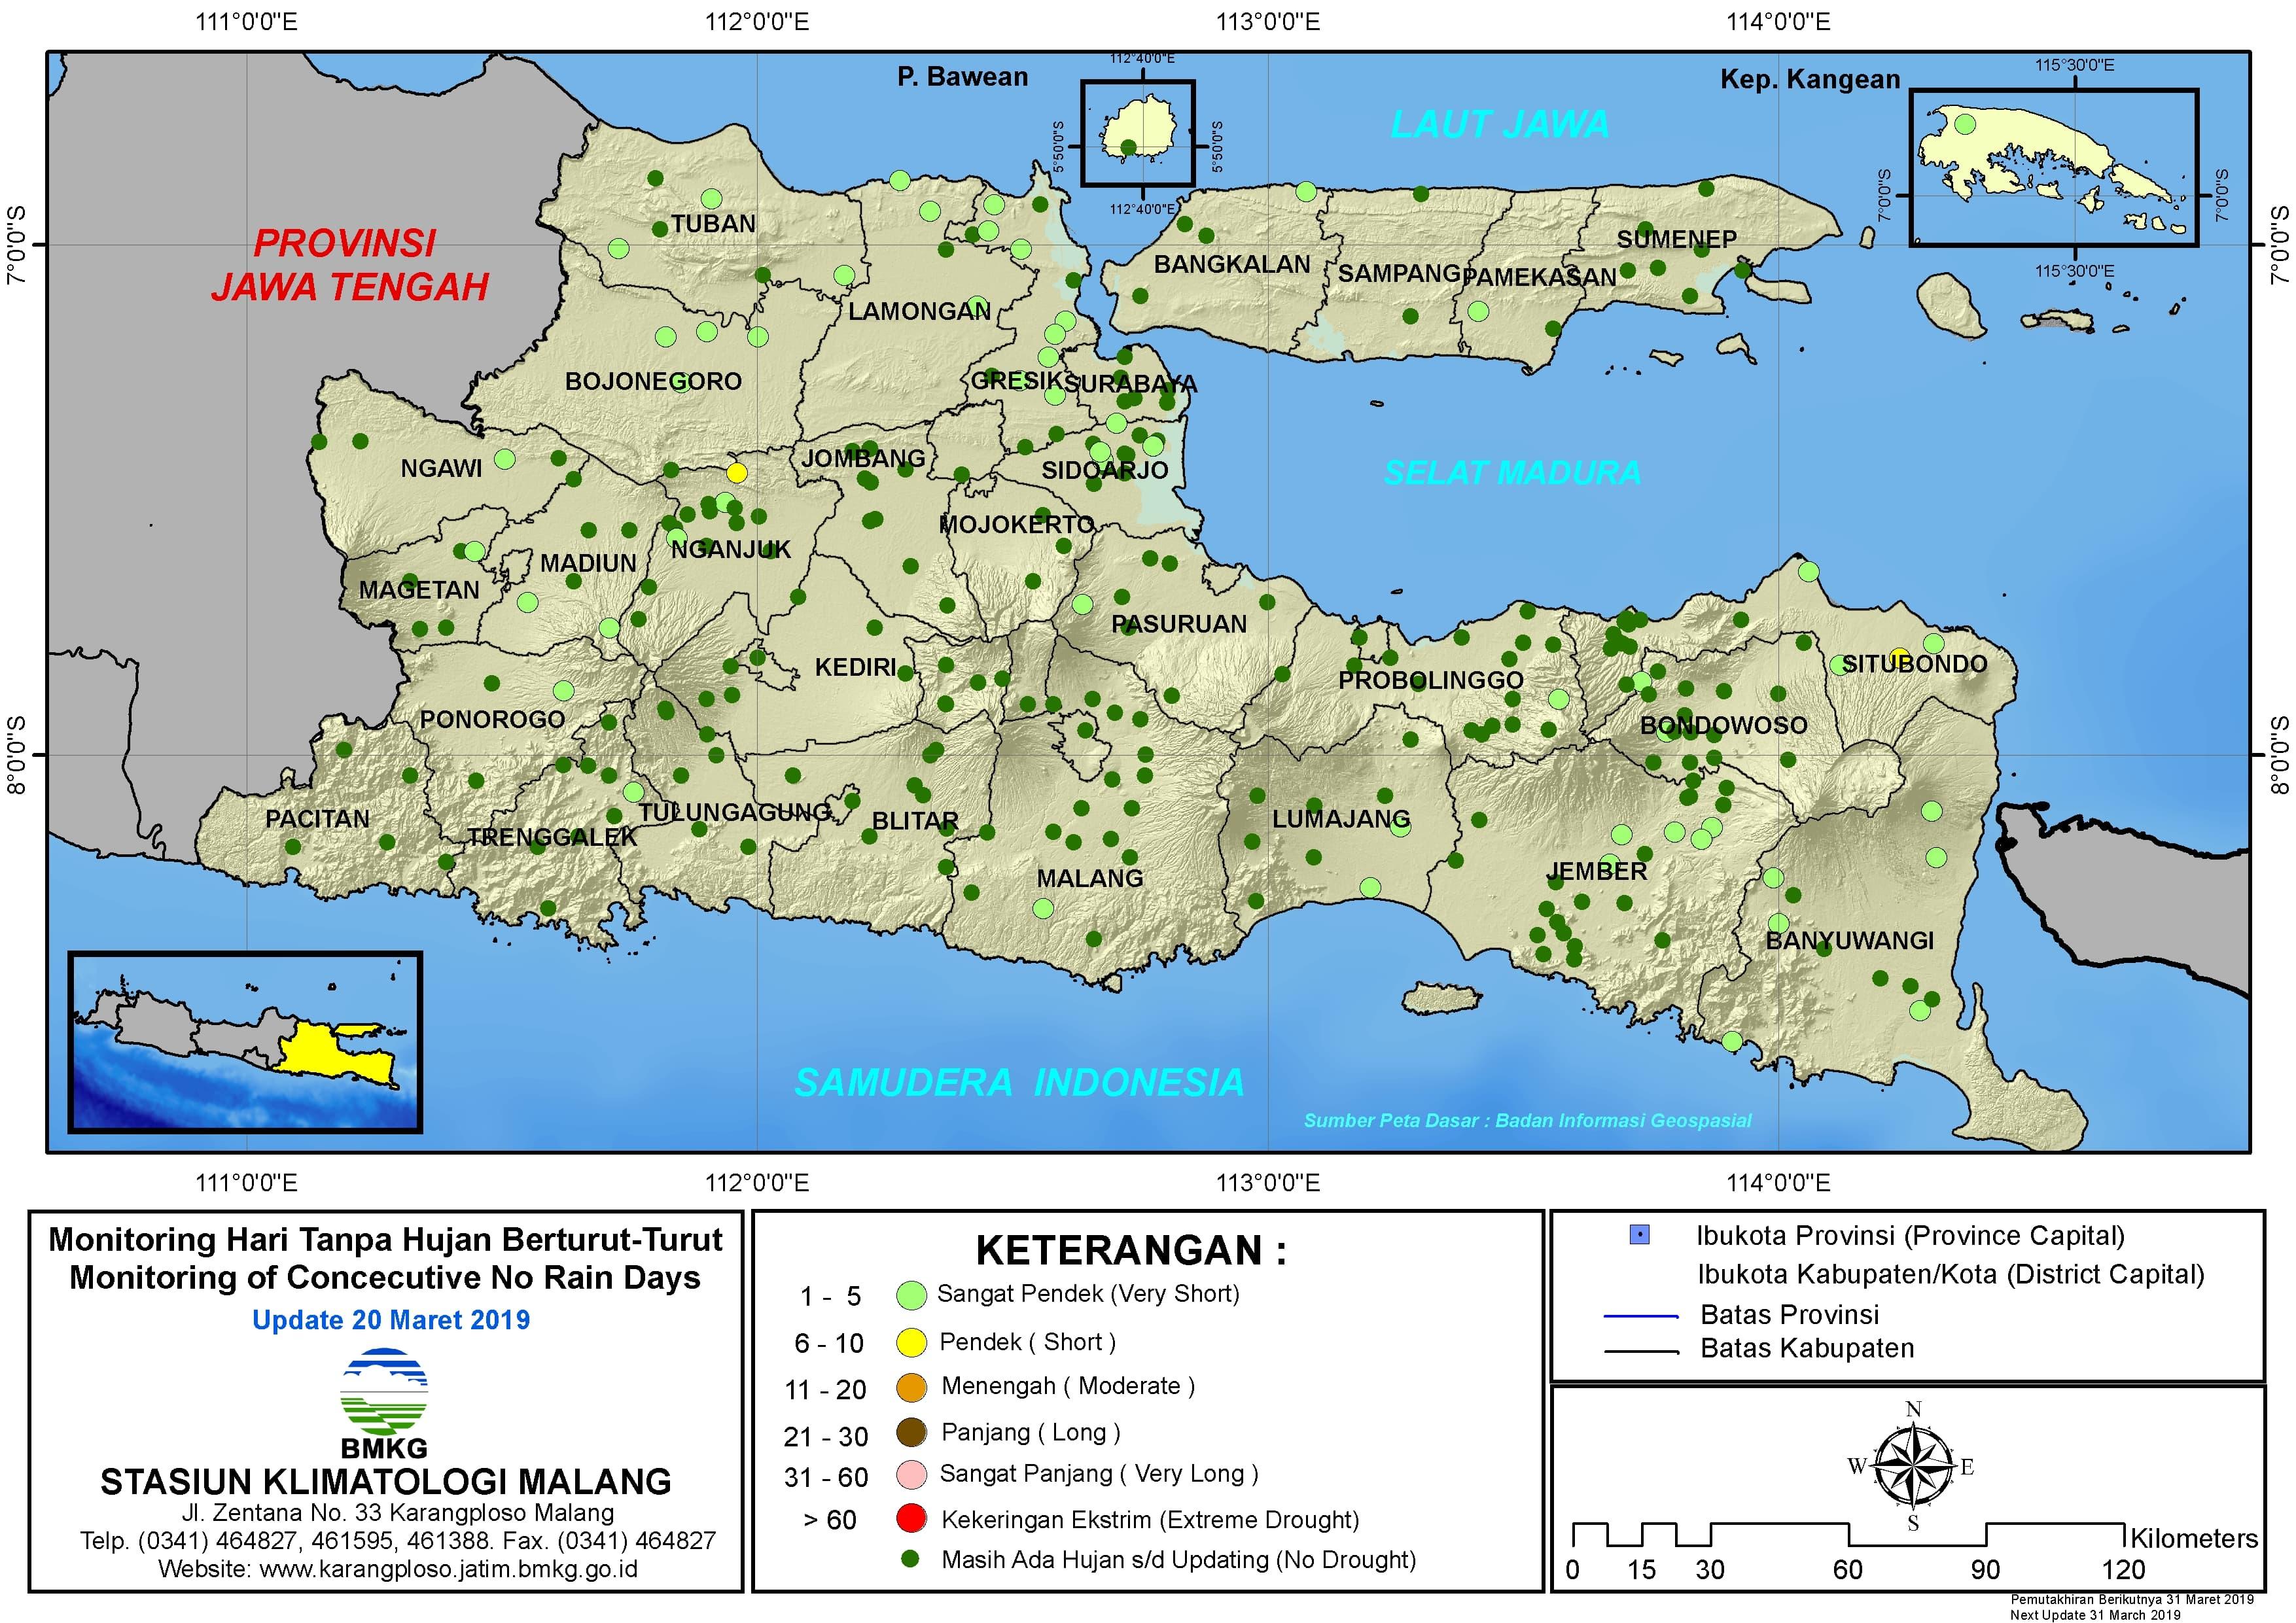 Peta Monitoring Hari Tanpa Hujan Berturut Turut Update 20 Maret 2019 di Provinsi Jawa Timur